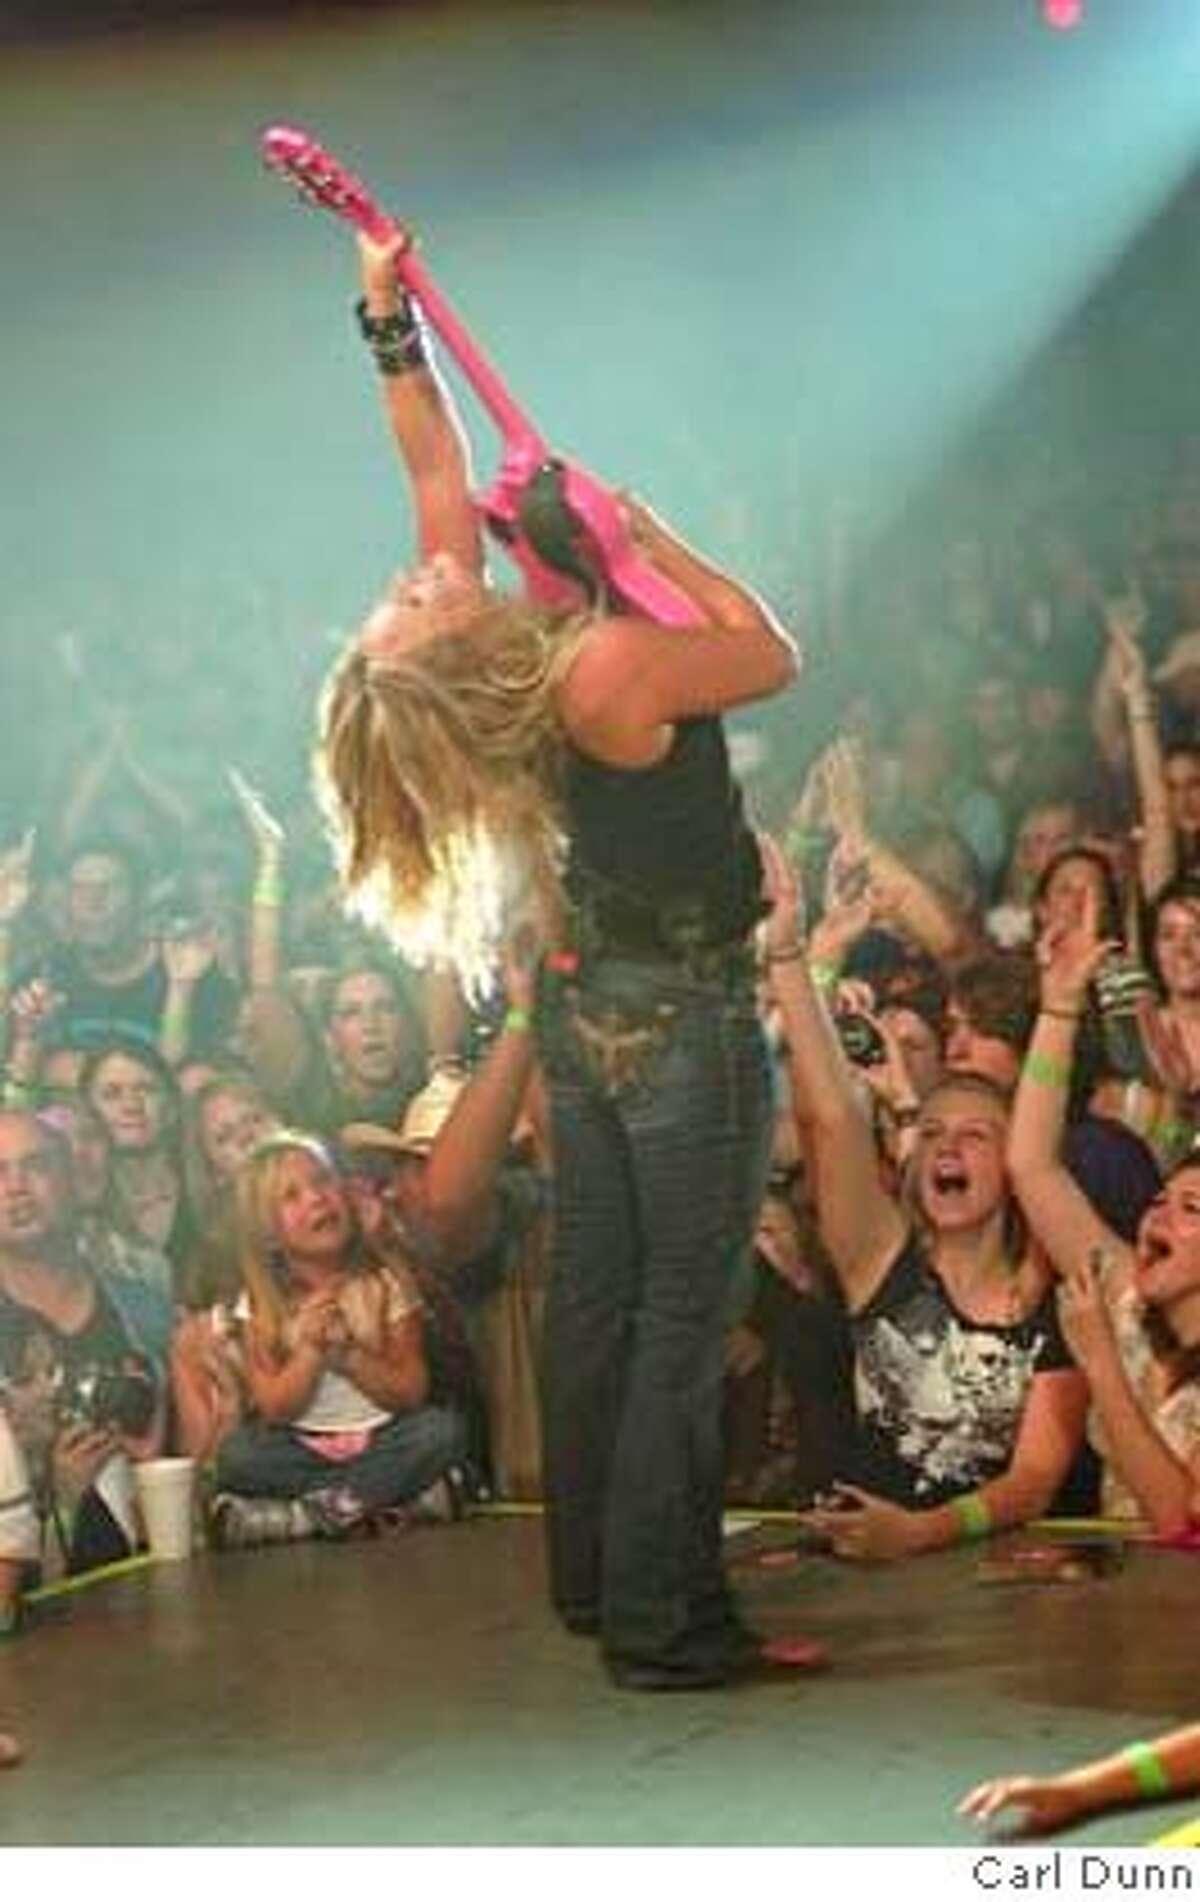 Miranda Lambert in concert photo by carl dunn